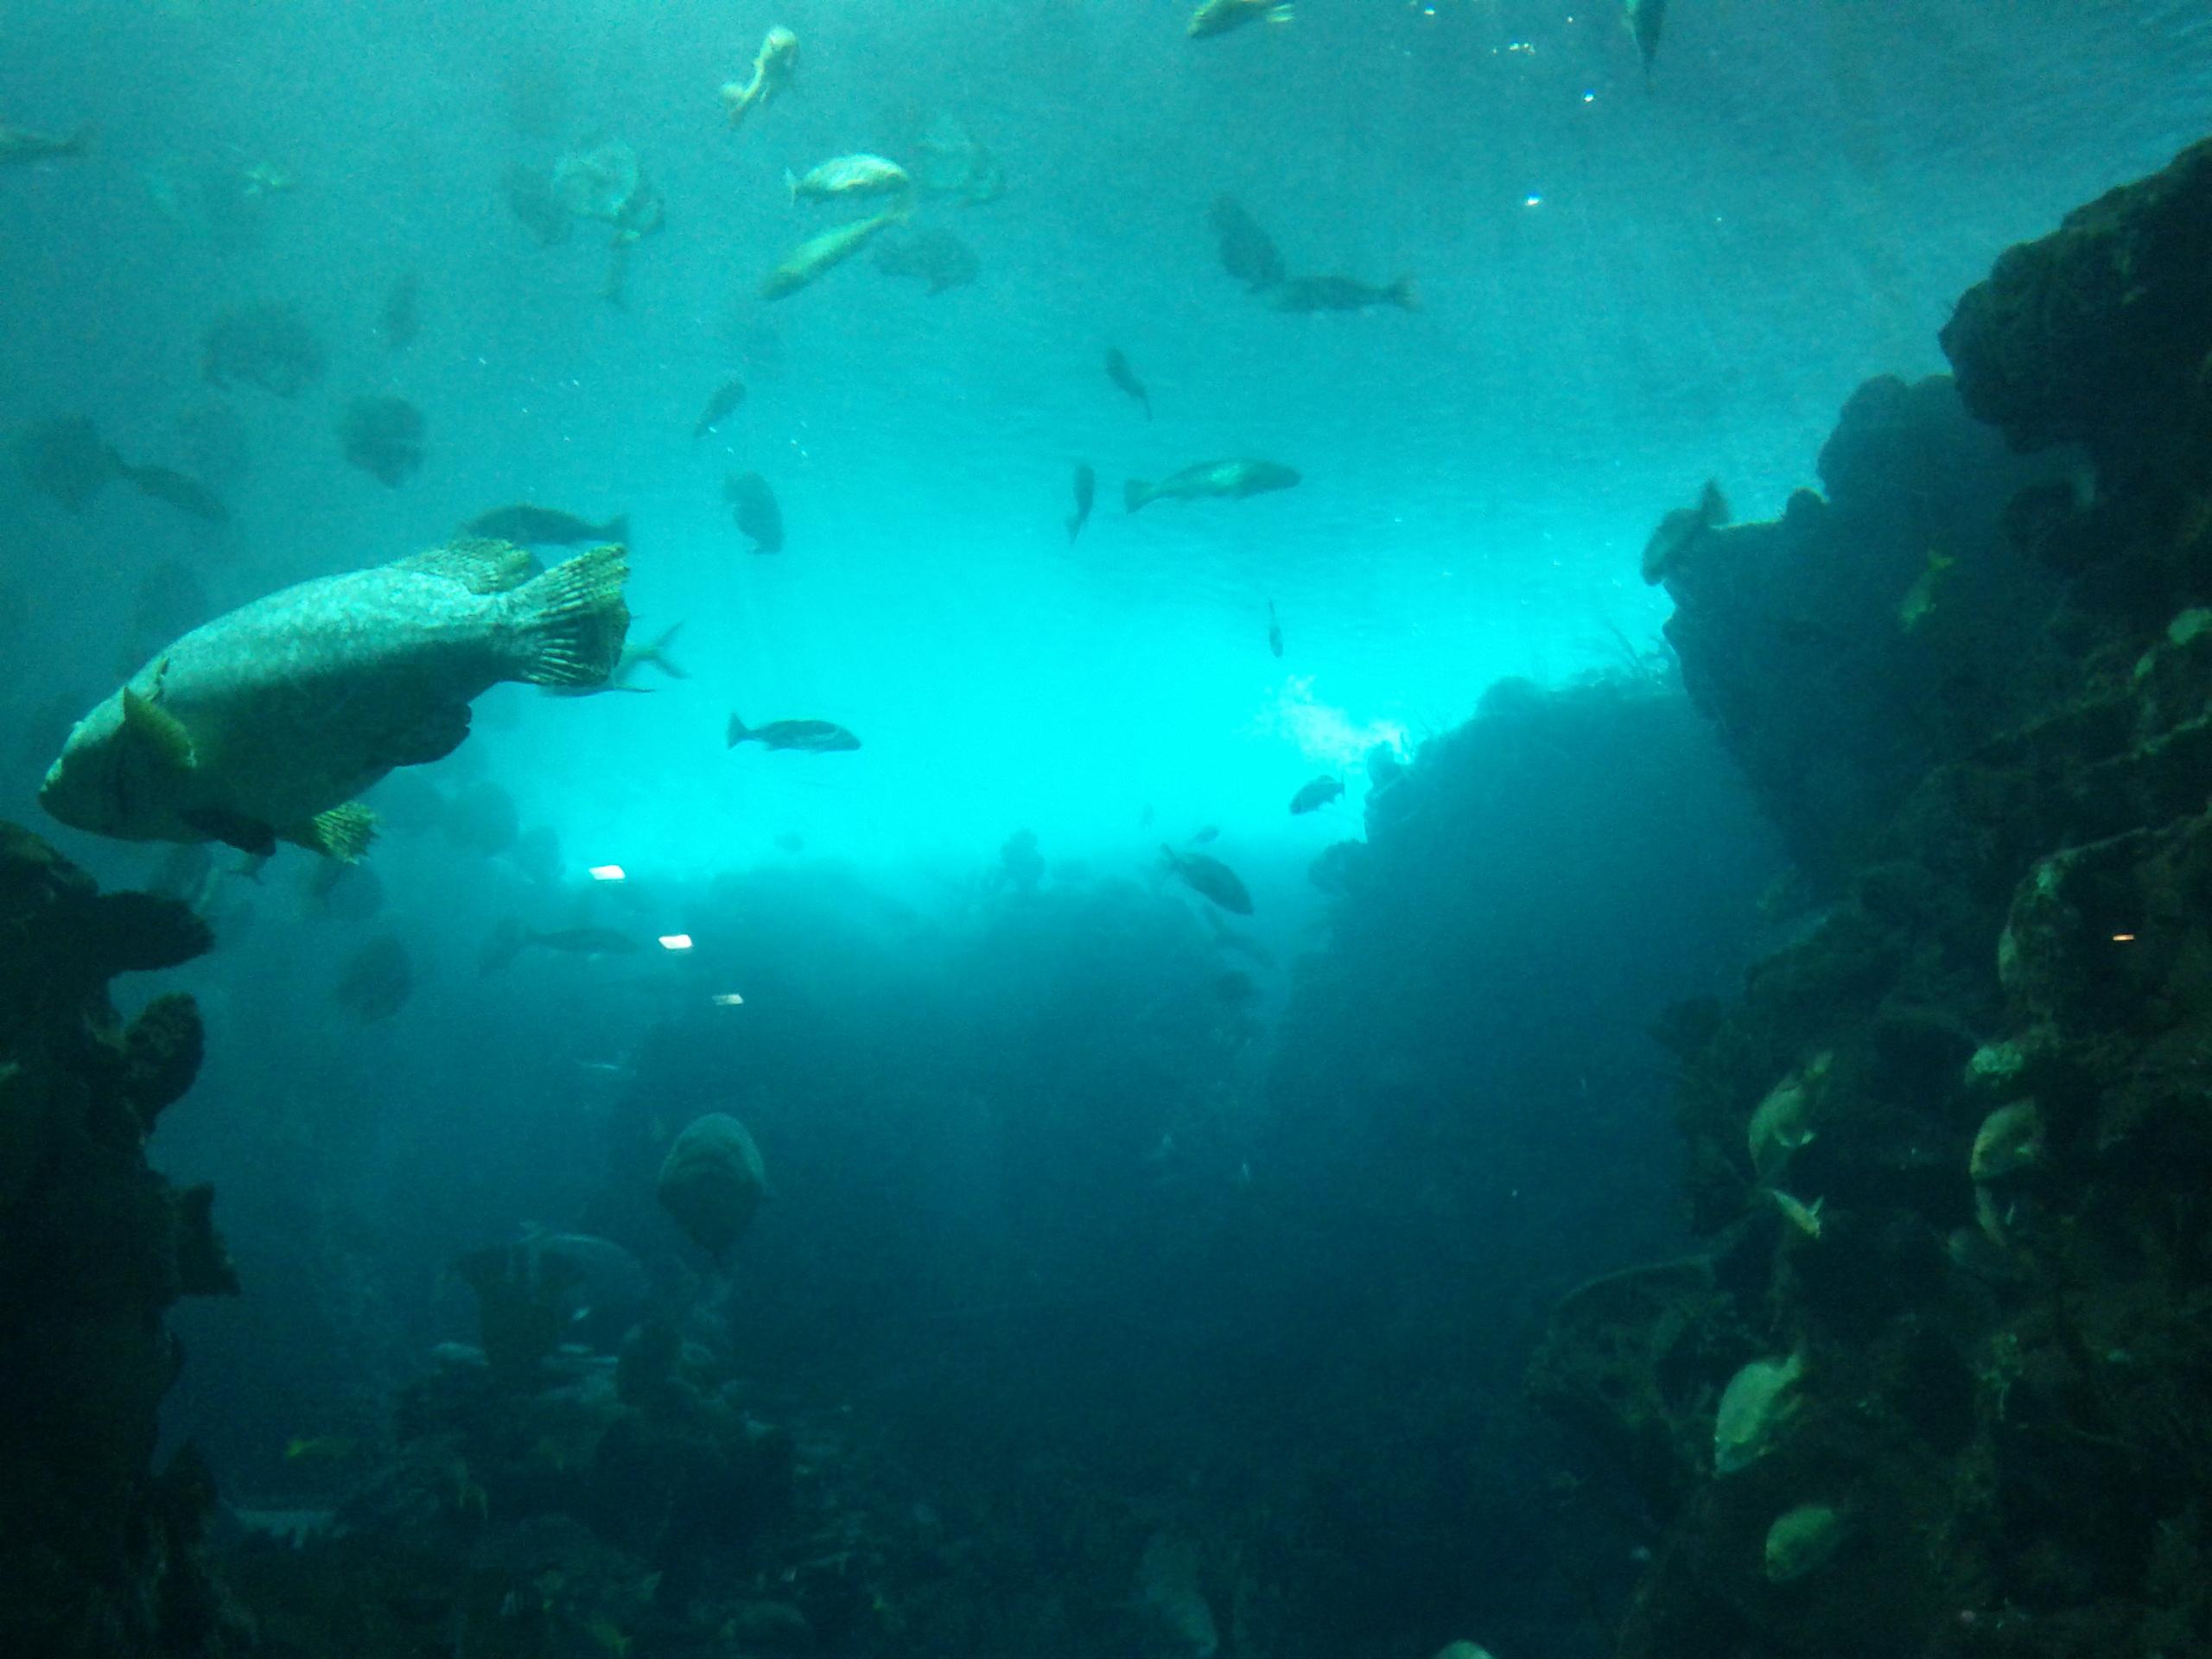 Big Sea fish at Guangzhou zoo aquarium